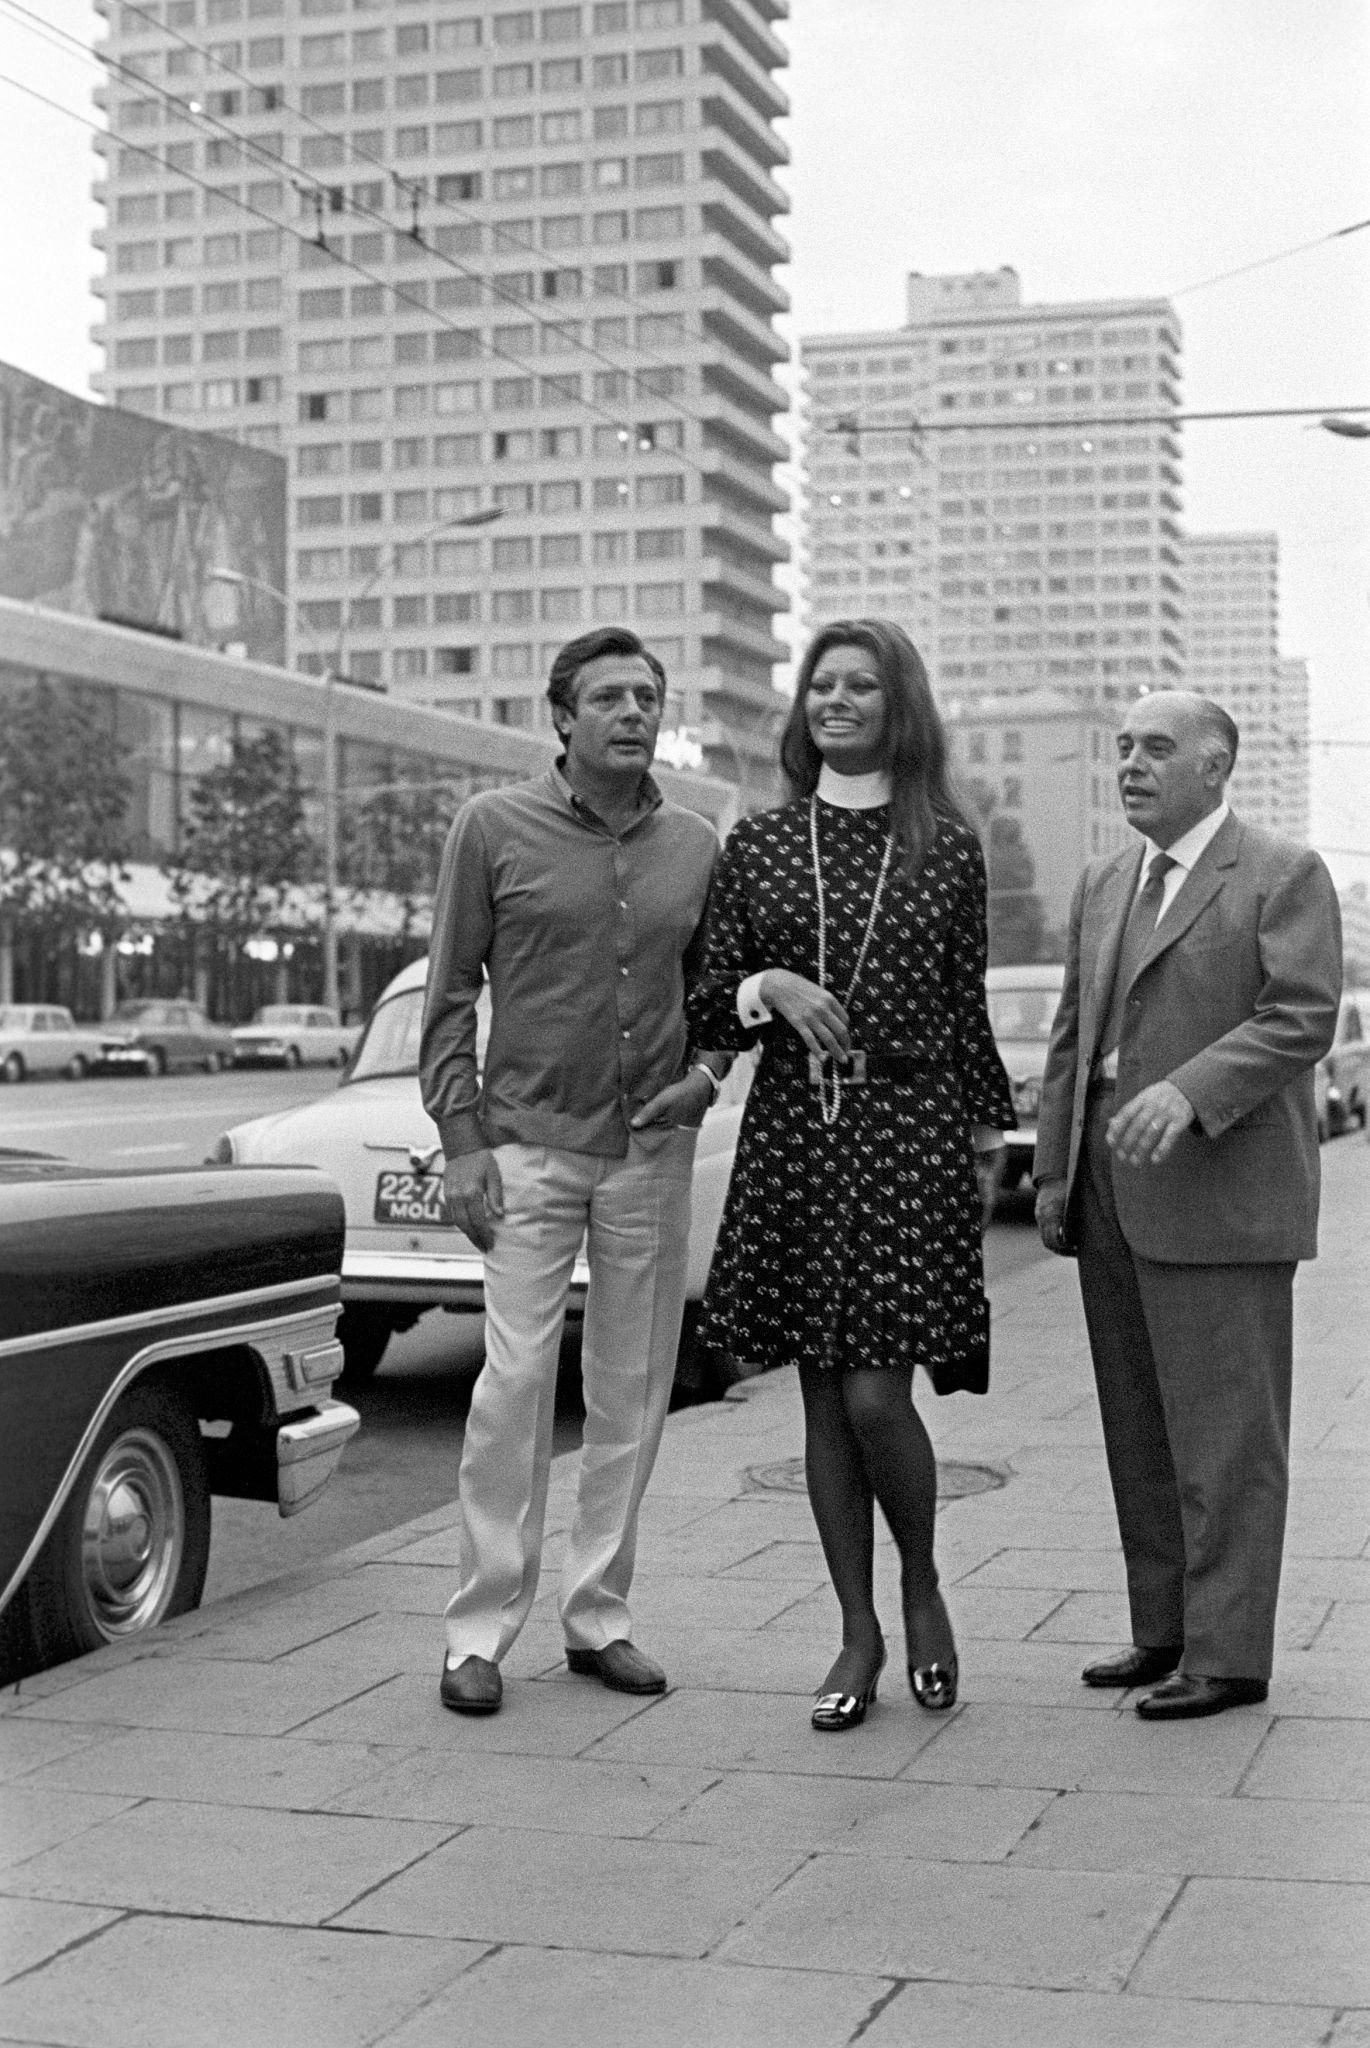 1969. Марчелло Мастроянни, Софи Лорен и Карло Понти на проспекте Калинина.jpg